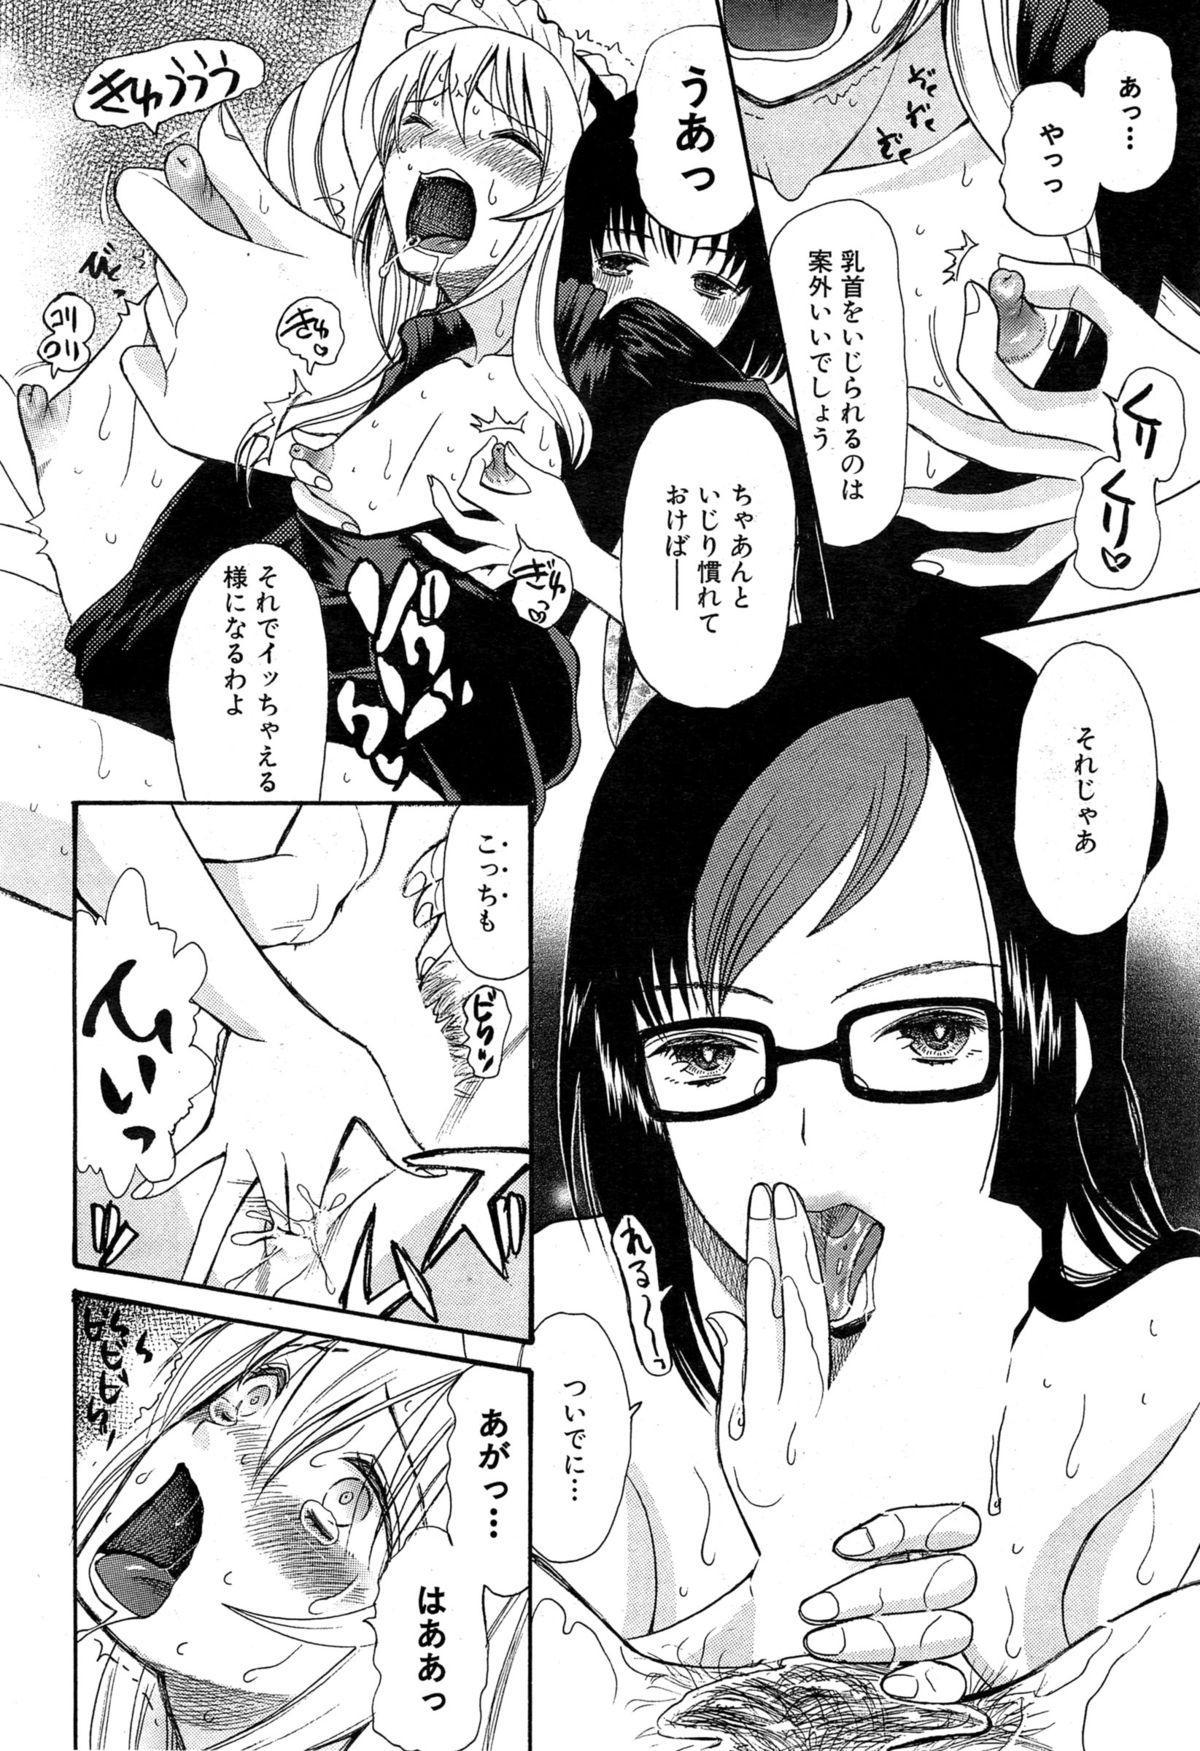 Kawaiku Natte Omocha ni Natte 73